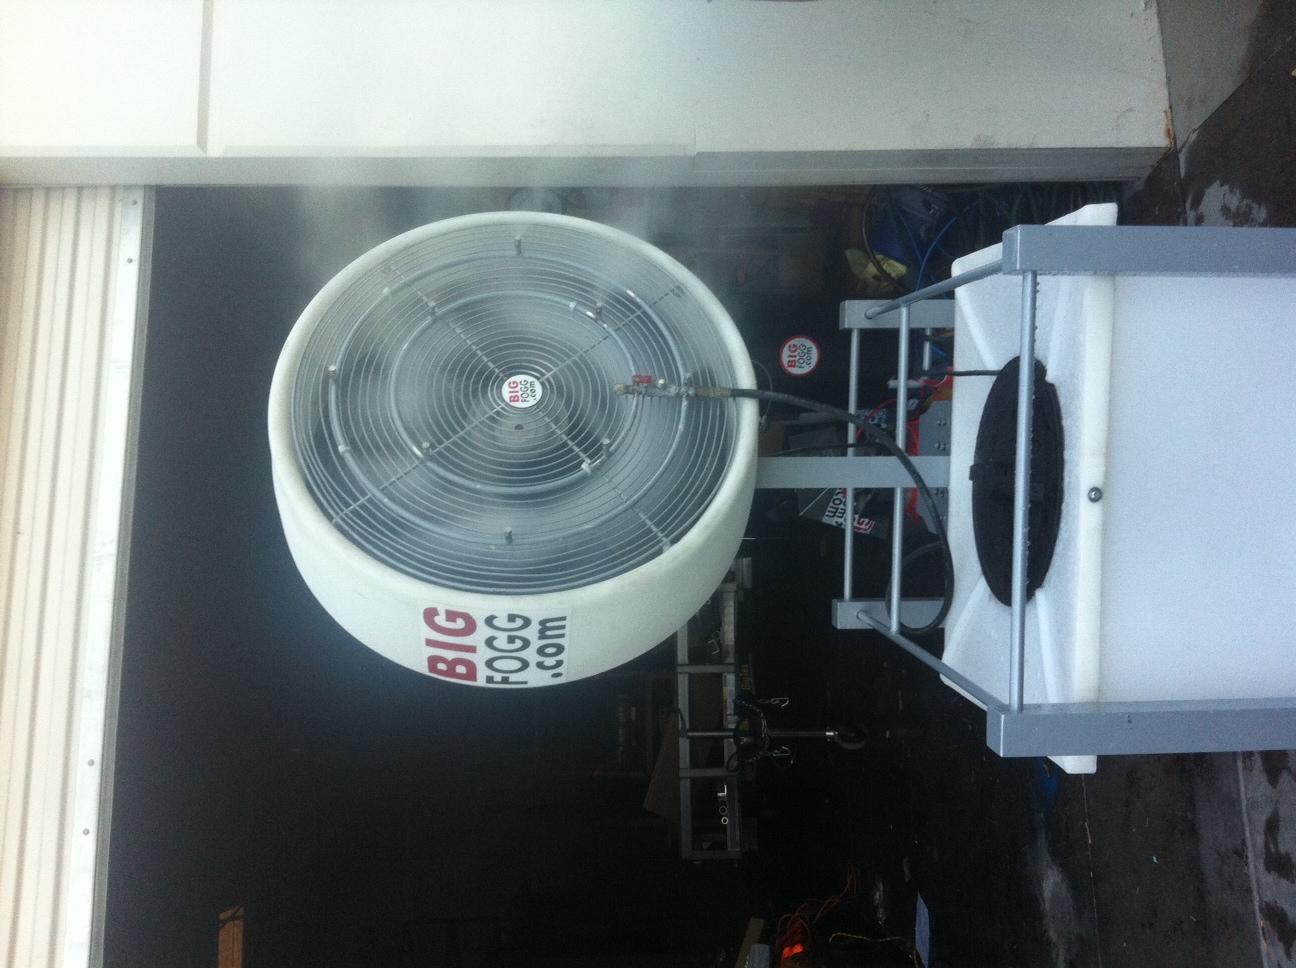 Big Fogg High-Pressure Misting Fan with 40' Gallon Tank outside a garage